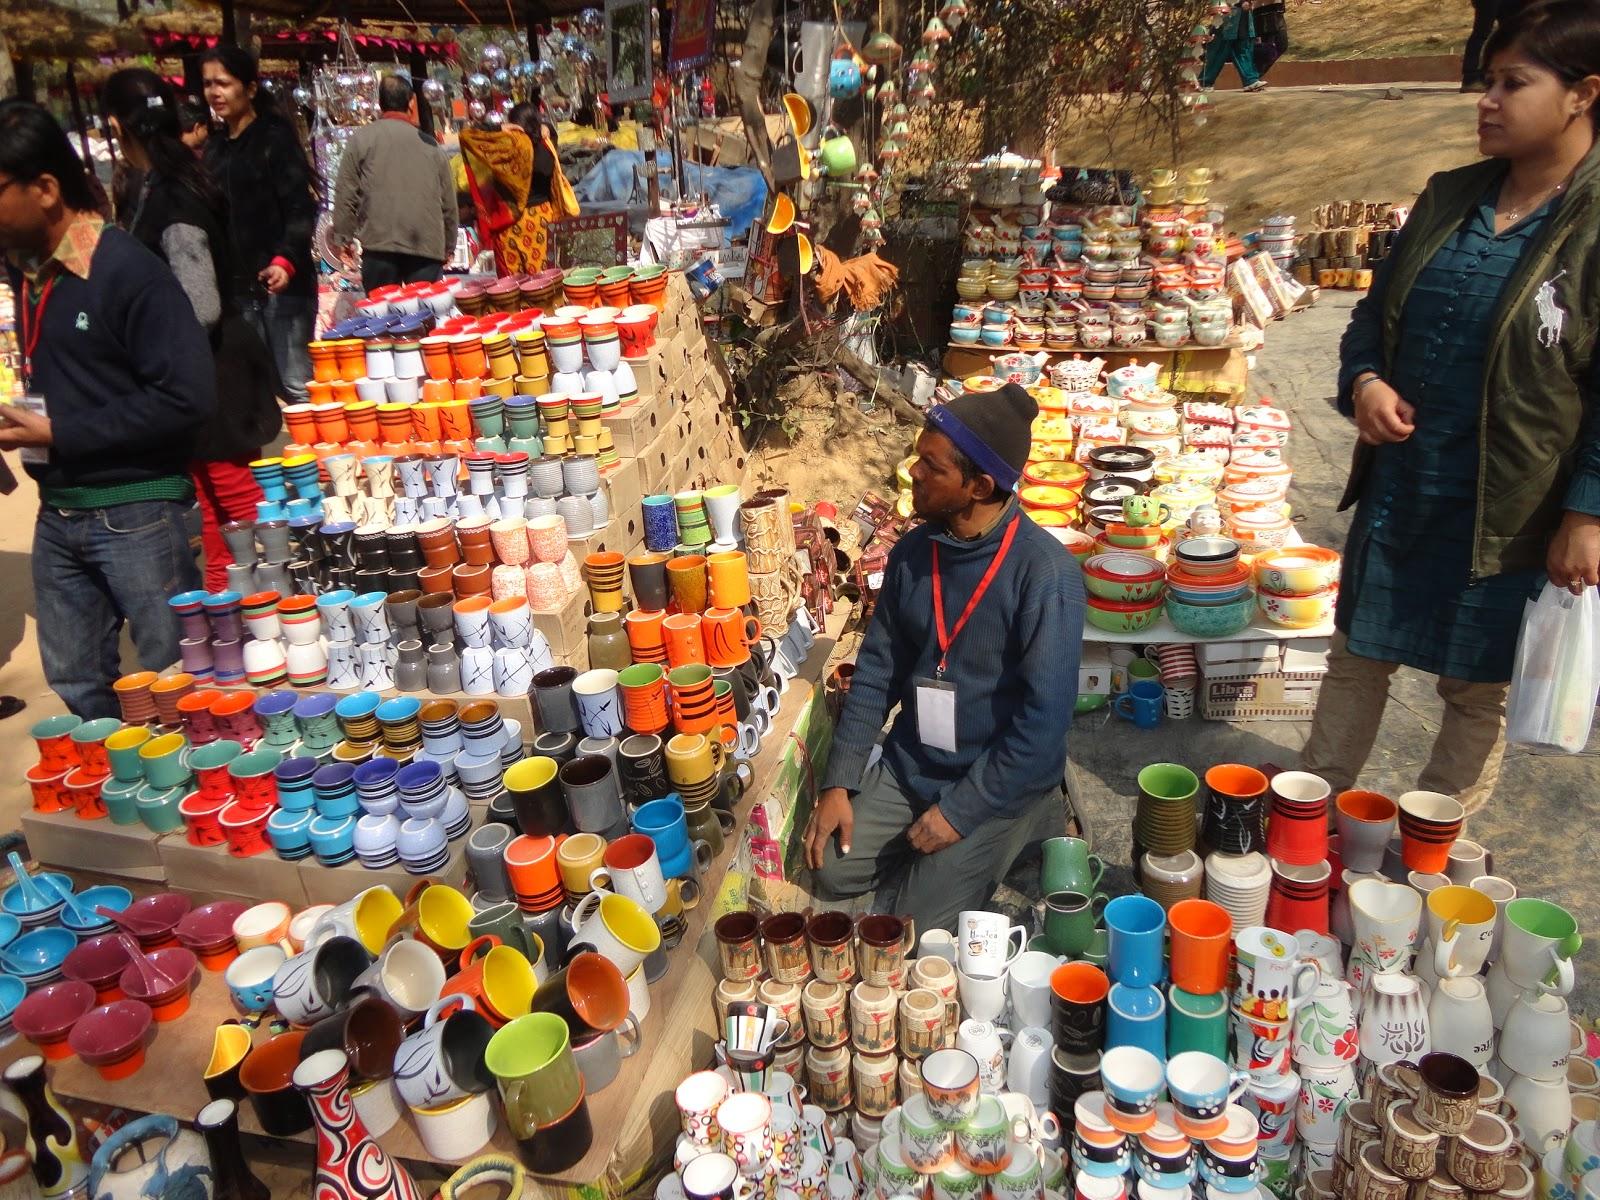 Colorful Coffee Mugs at Surajkund Crafts Mela,India